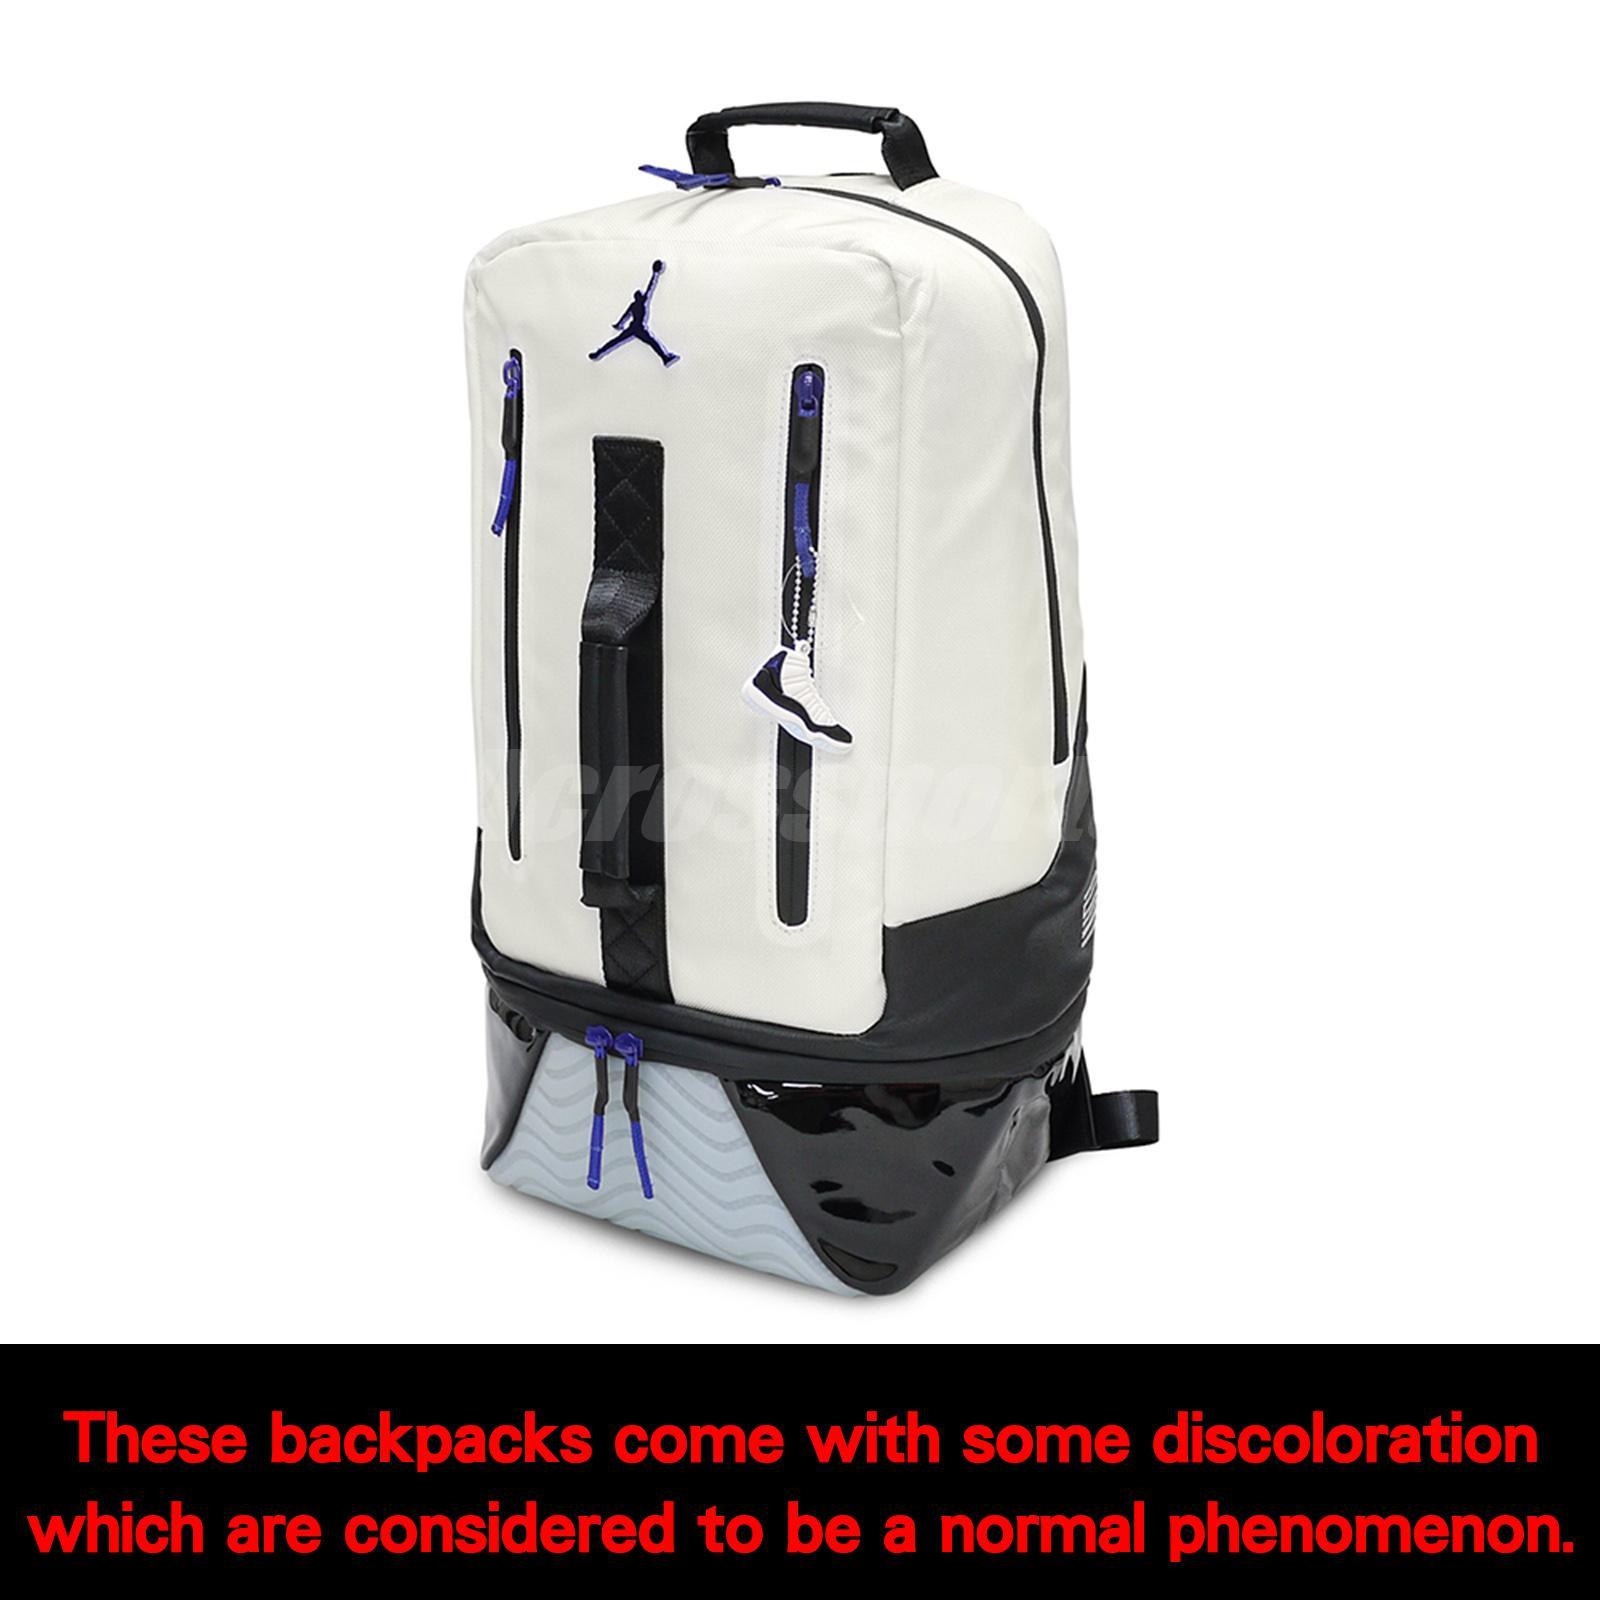 d49faa172e39 Nike Jordan Retro 11 Concord XI White Black Air Backpack Bookbag 2018 9A1971 -637